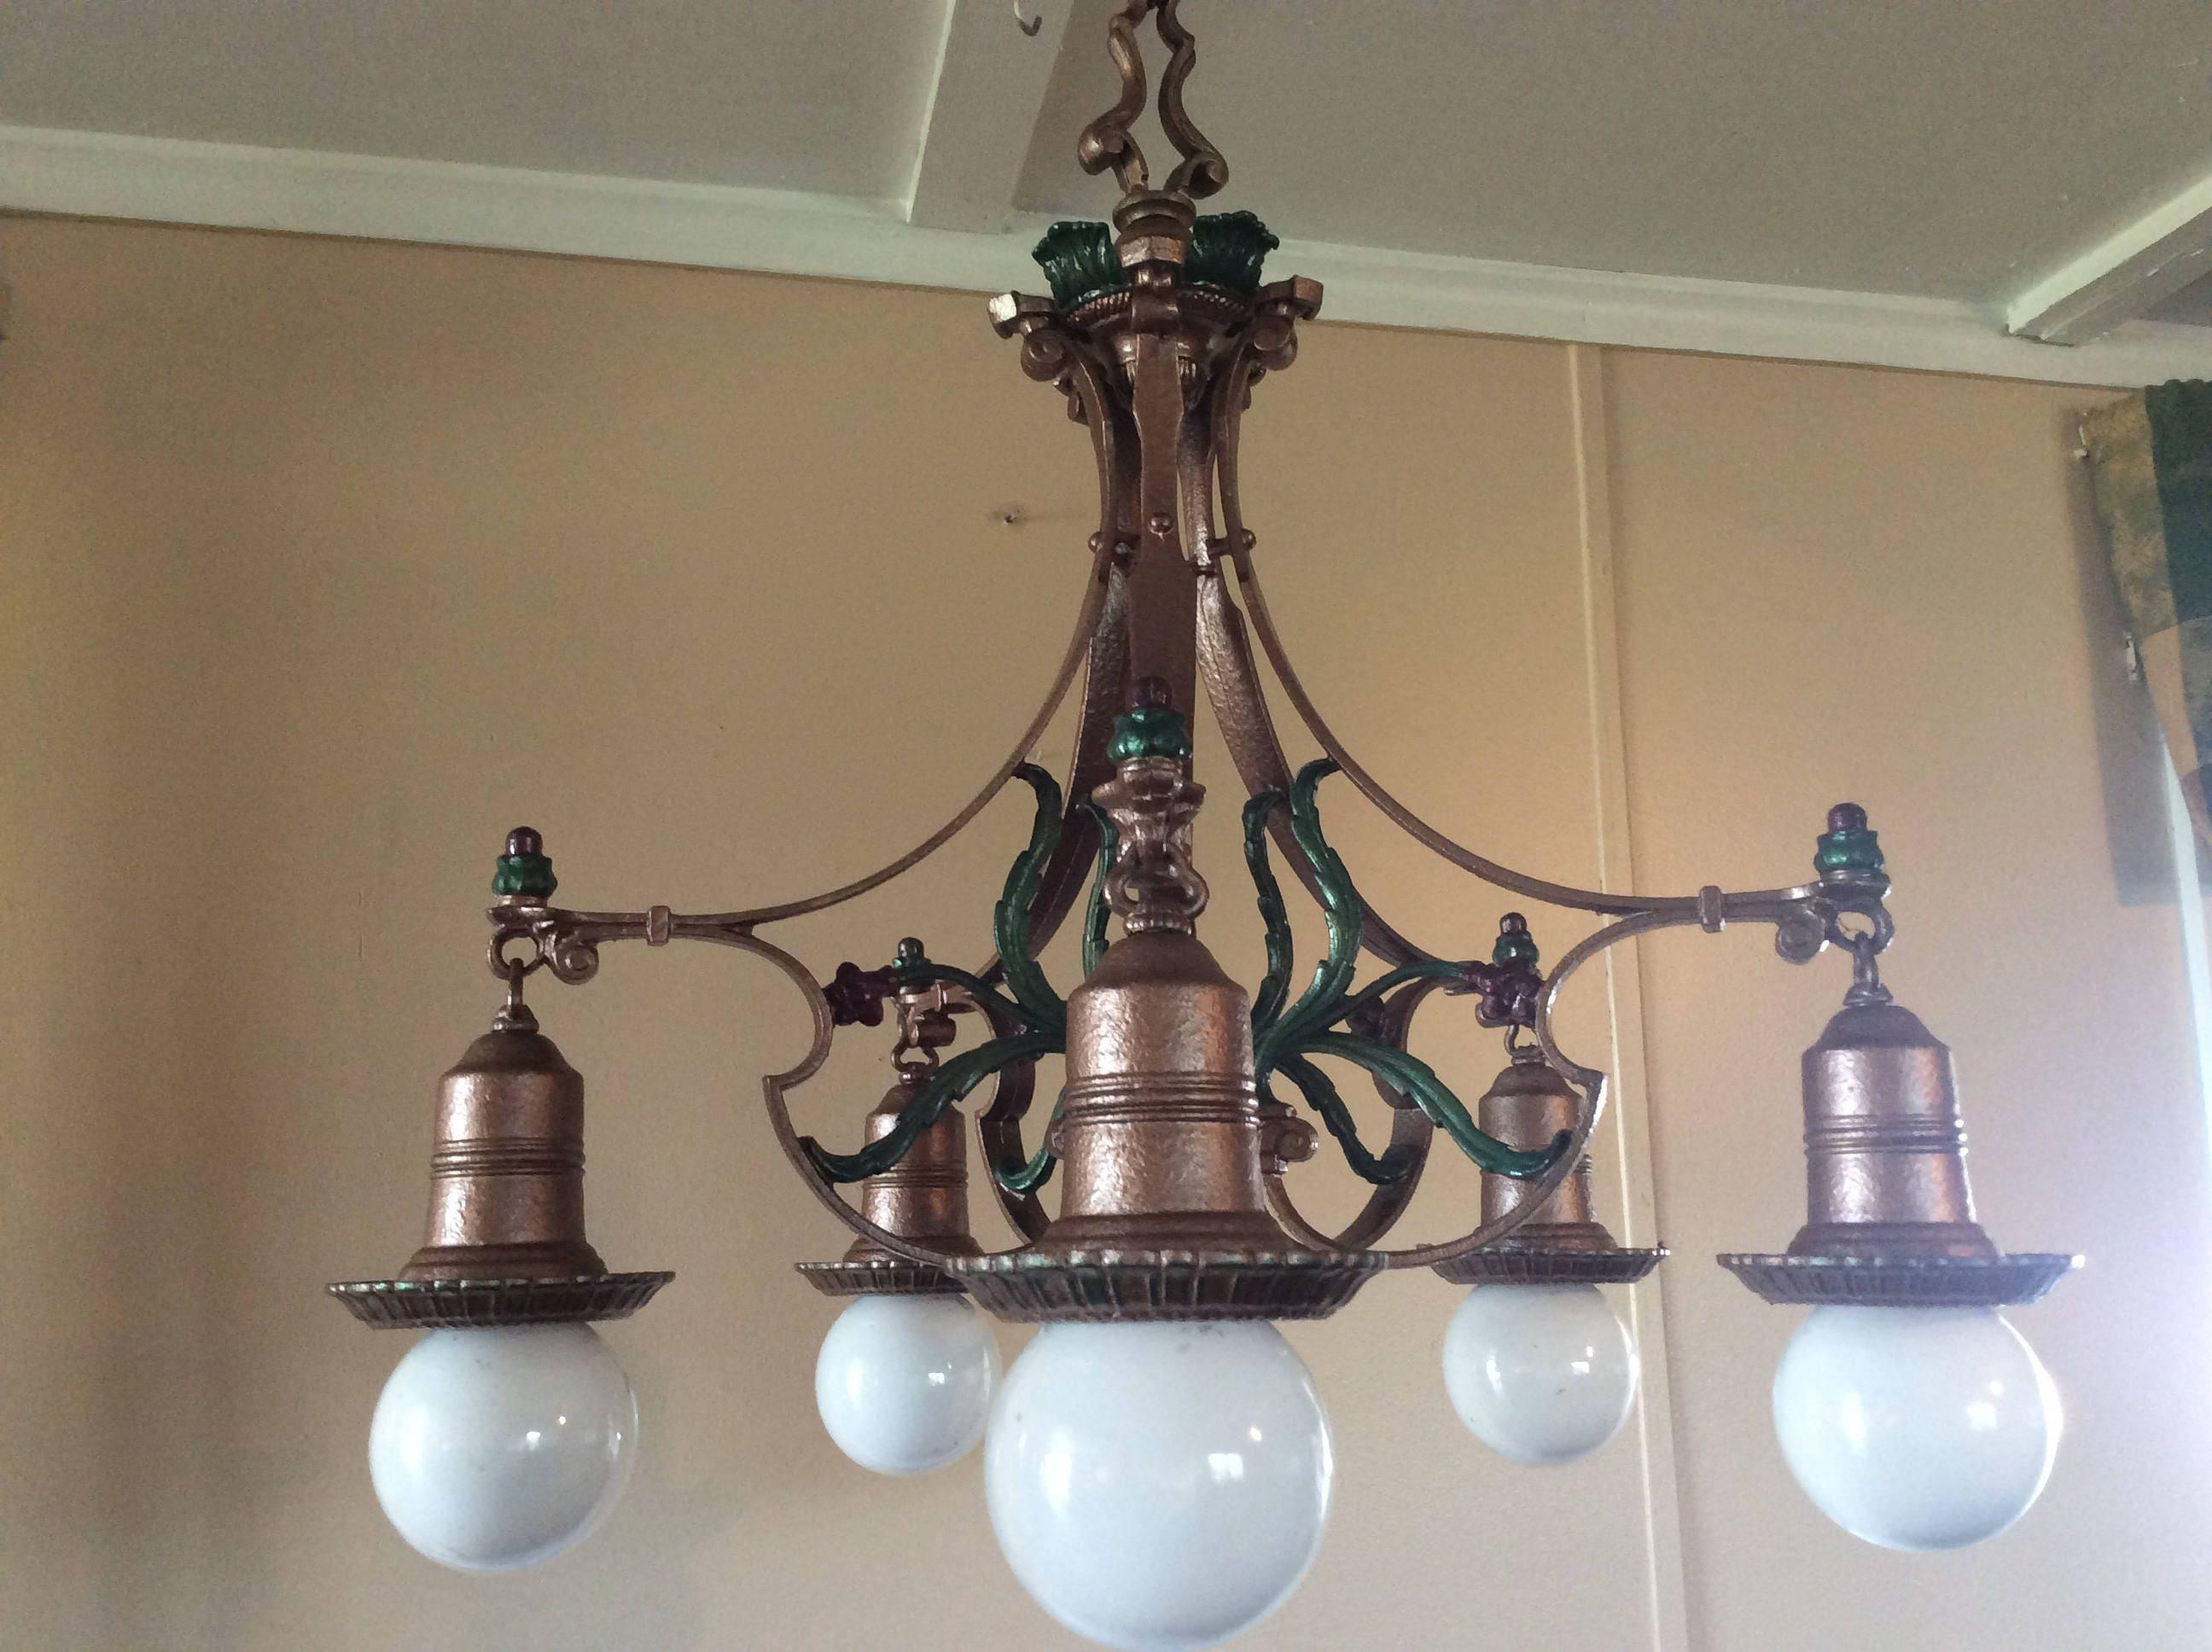 Antique art deco 5 bulb hanging light chandelier 1920s polychrome antique art deco 5 bulb hanging light chandelier 1920s polychrome uses bulbs or shades arubaitofo Gallery